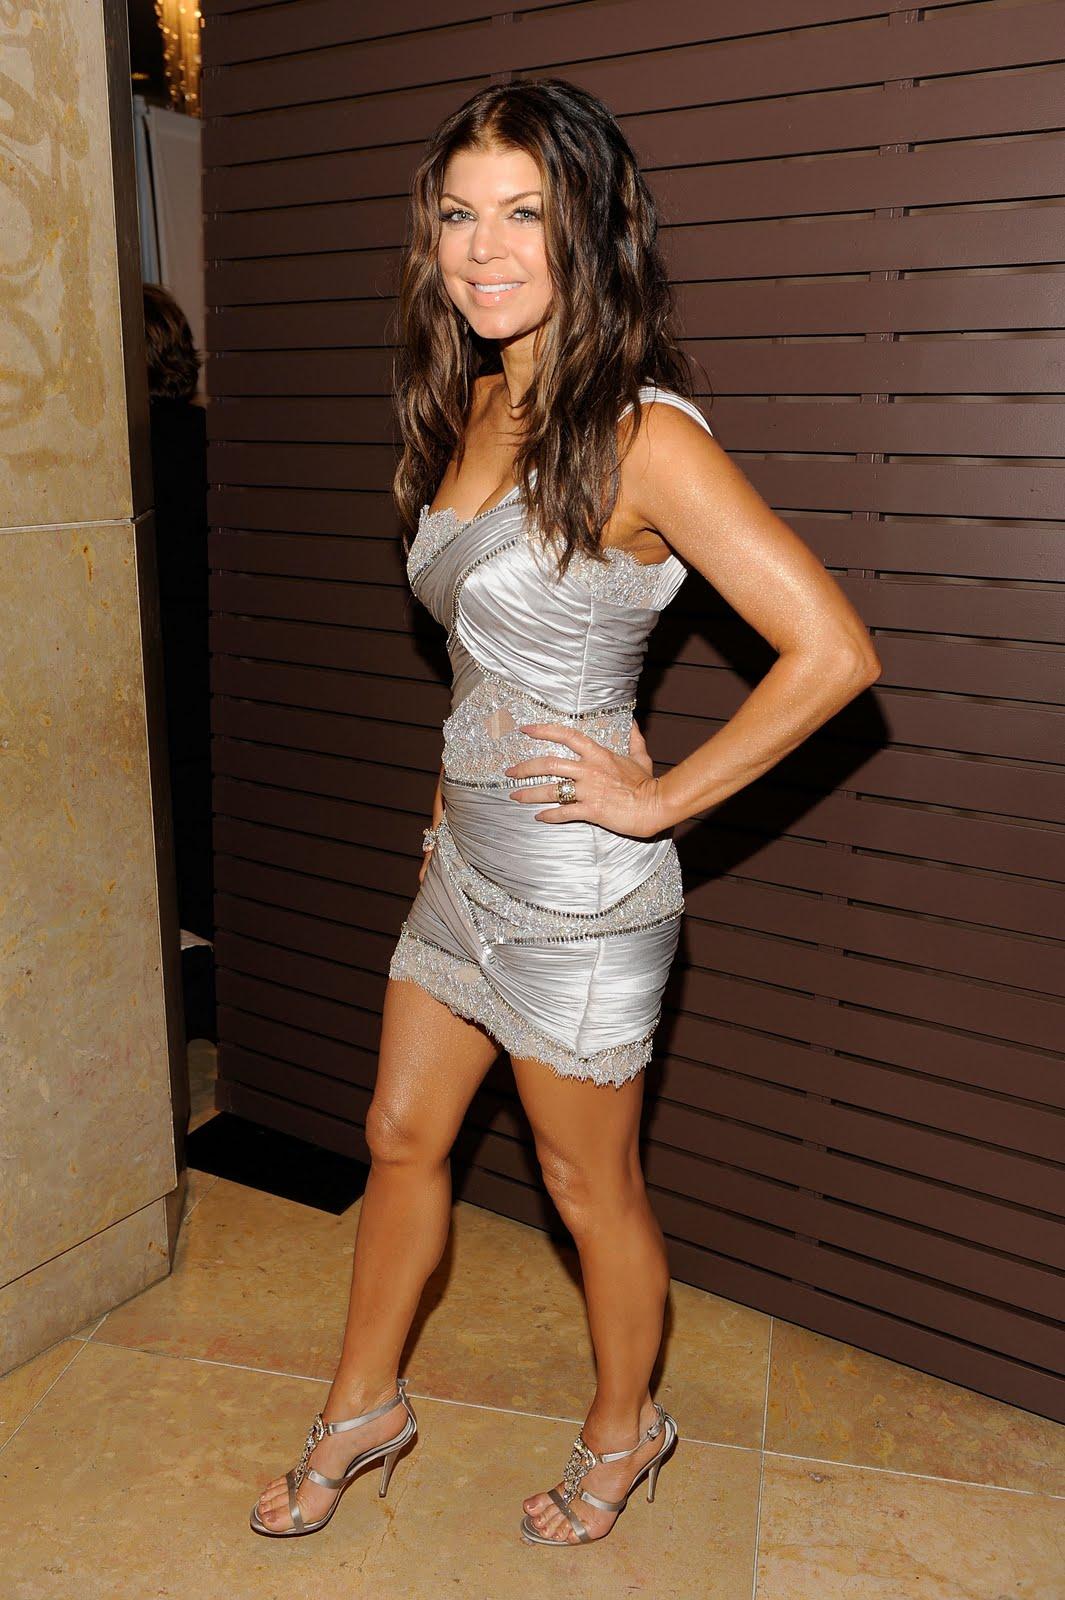 http://2.bp.blogspot.com/_VvCaQlz5Gvs/S8fngqNer1I/AAAAAAAABnU/iP4WphanG54/s1600/Fergie+sexy+legs.33.jpg